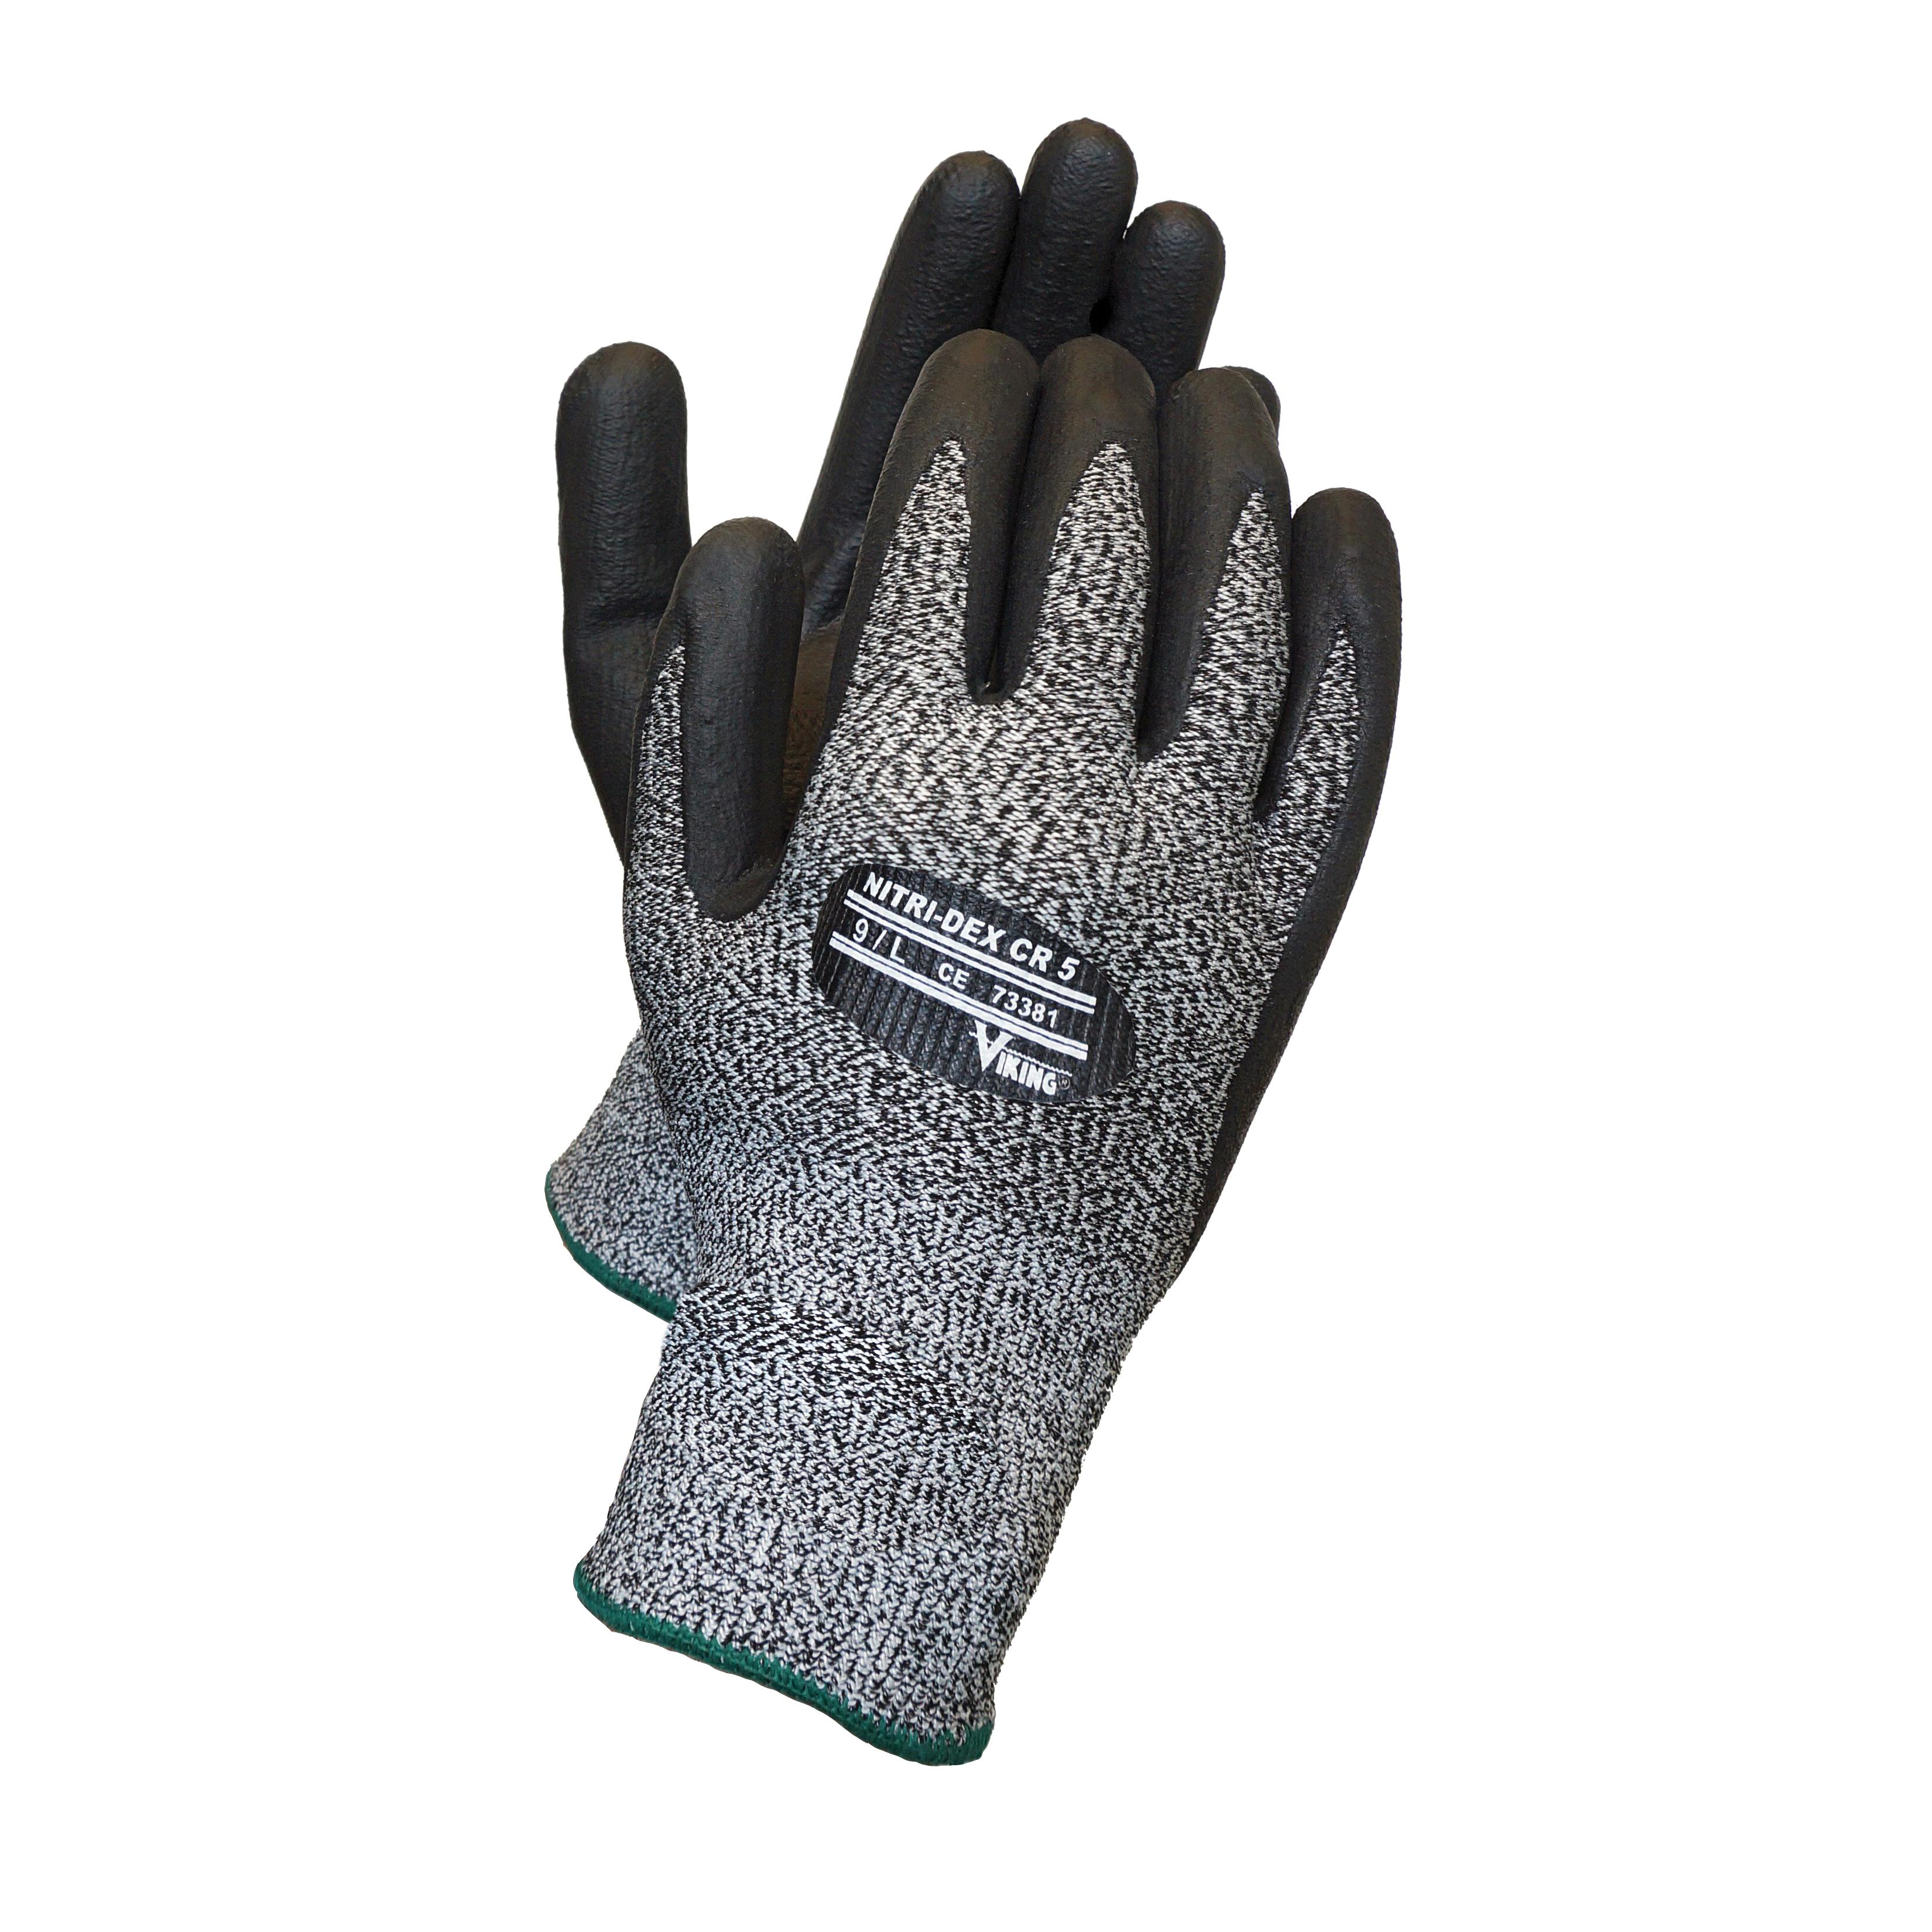 Viking® 73381-10 Cut-Resistant Gloves, XL/SZ 10, Nitrile Butadiene Rubber Coating, Nitrile Butadiene Rubber, Resists: Abrasion, Cut, Puncture and Tear, ANSI Cut-Resistance Level: A4